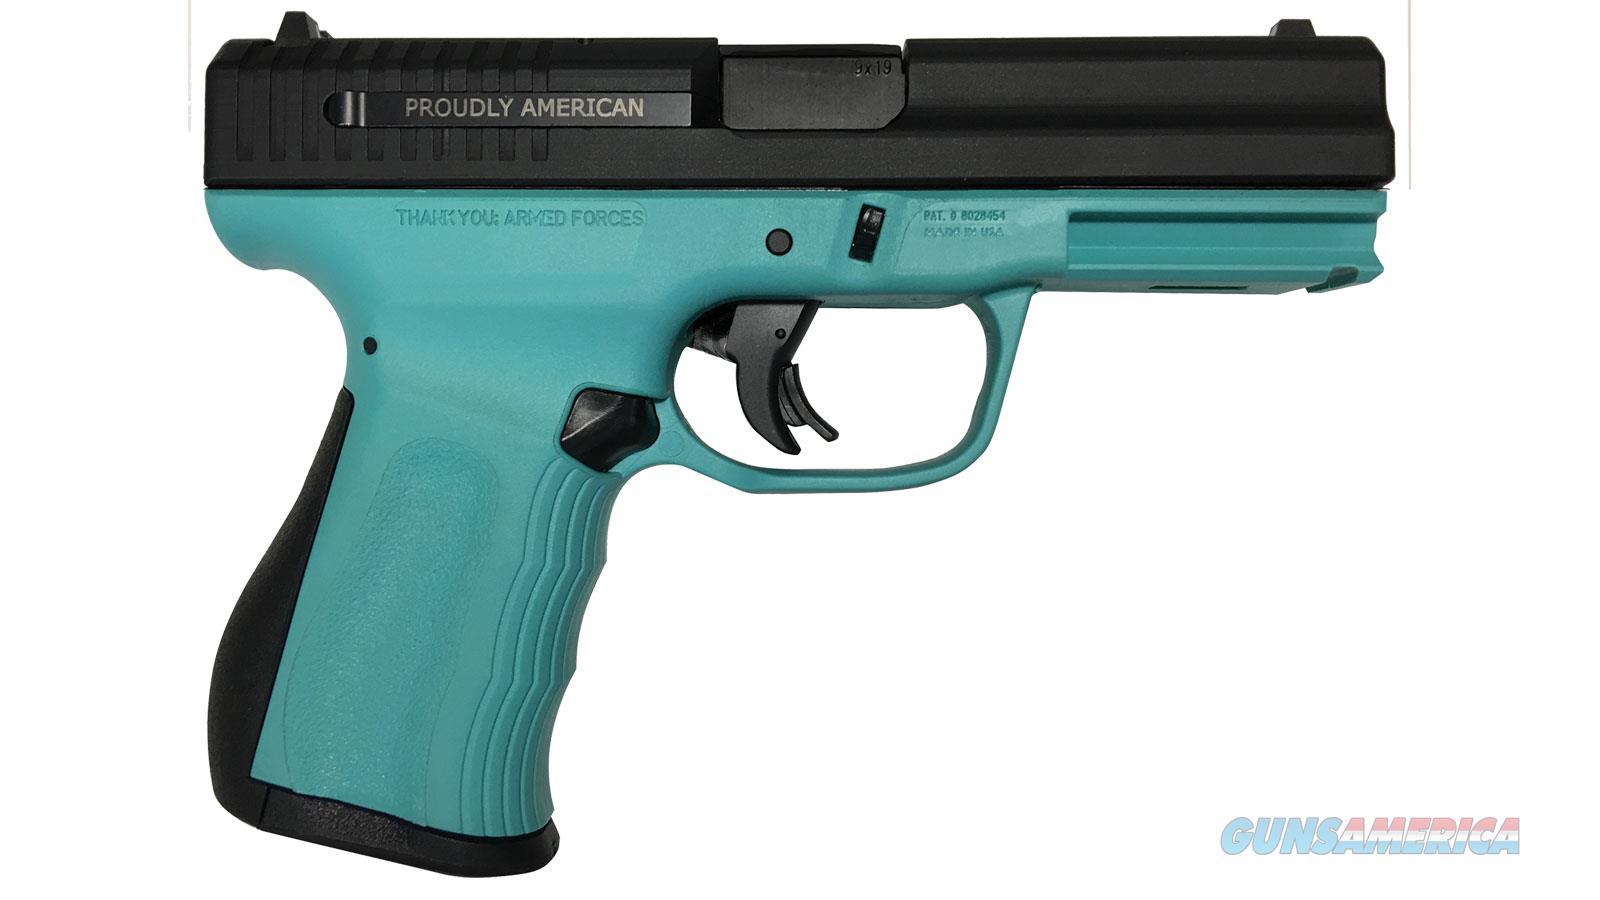 Fmk 9Mm G2 Compact Blue Jay 14 FMKG9C1G2TB  Guns > Pistols > F Misc Pistols